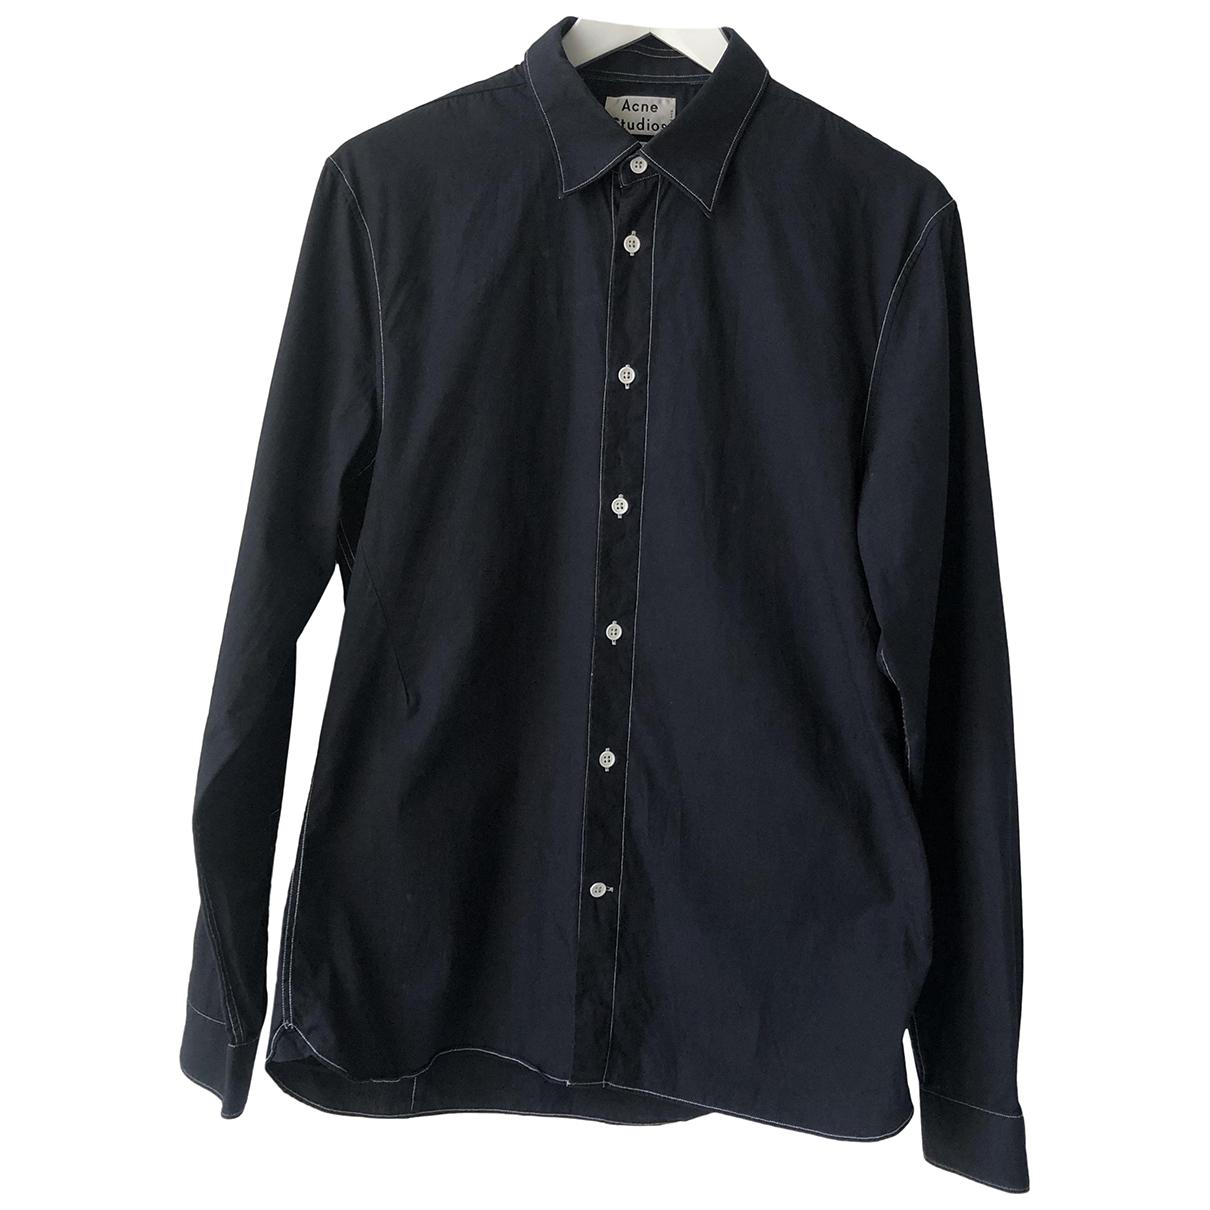 Acne Studios \N Black Cotton Shirts for Men M International